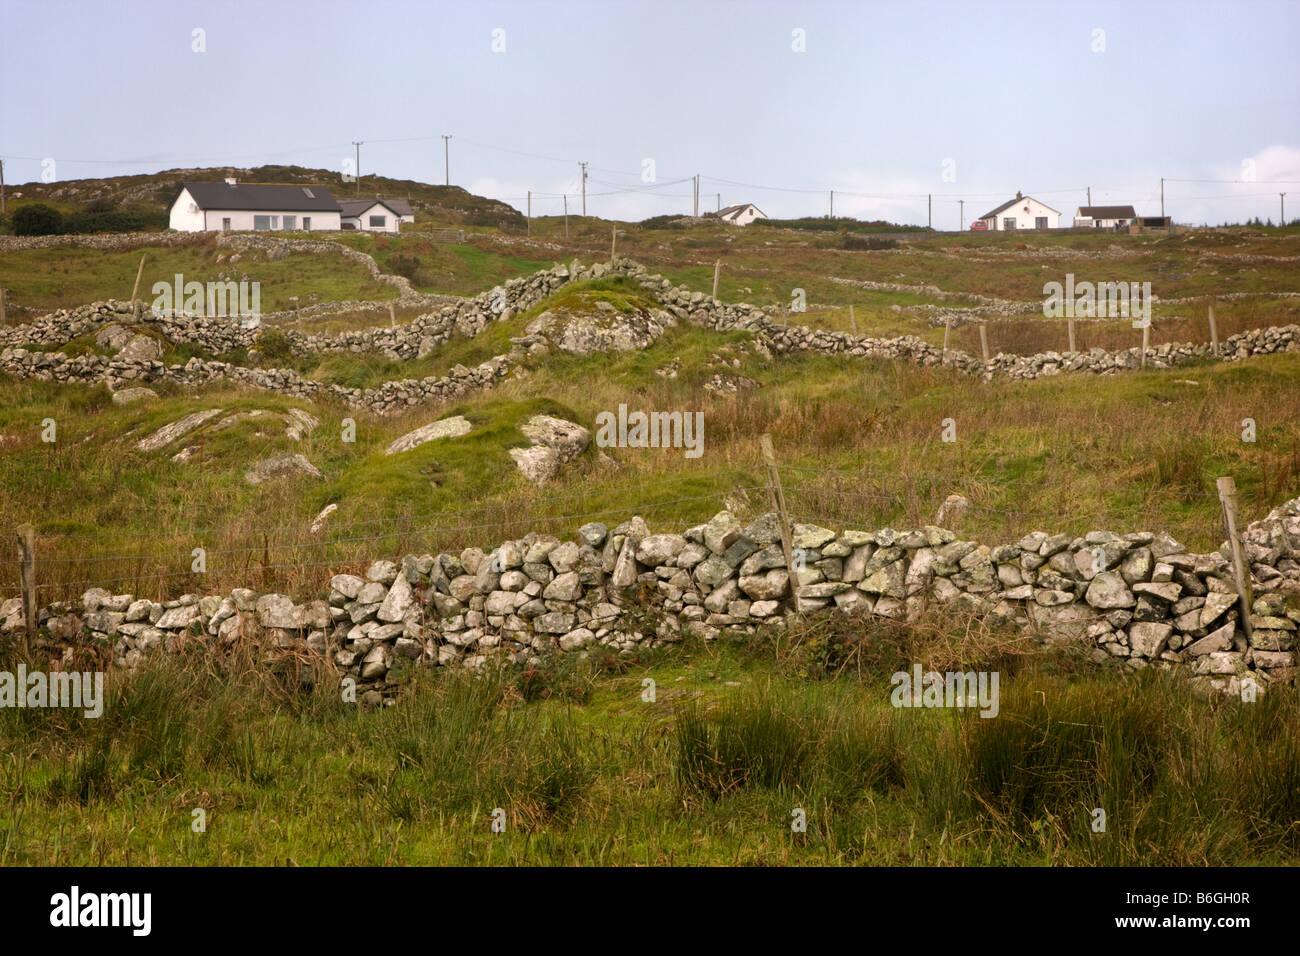 Stone walls and fields, Doonloughan, Connemara, Republic of Ireland - Stock Image